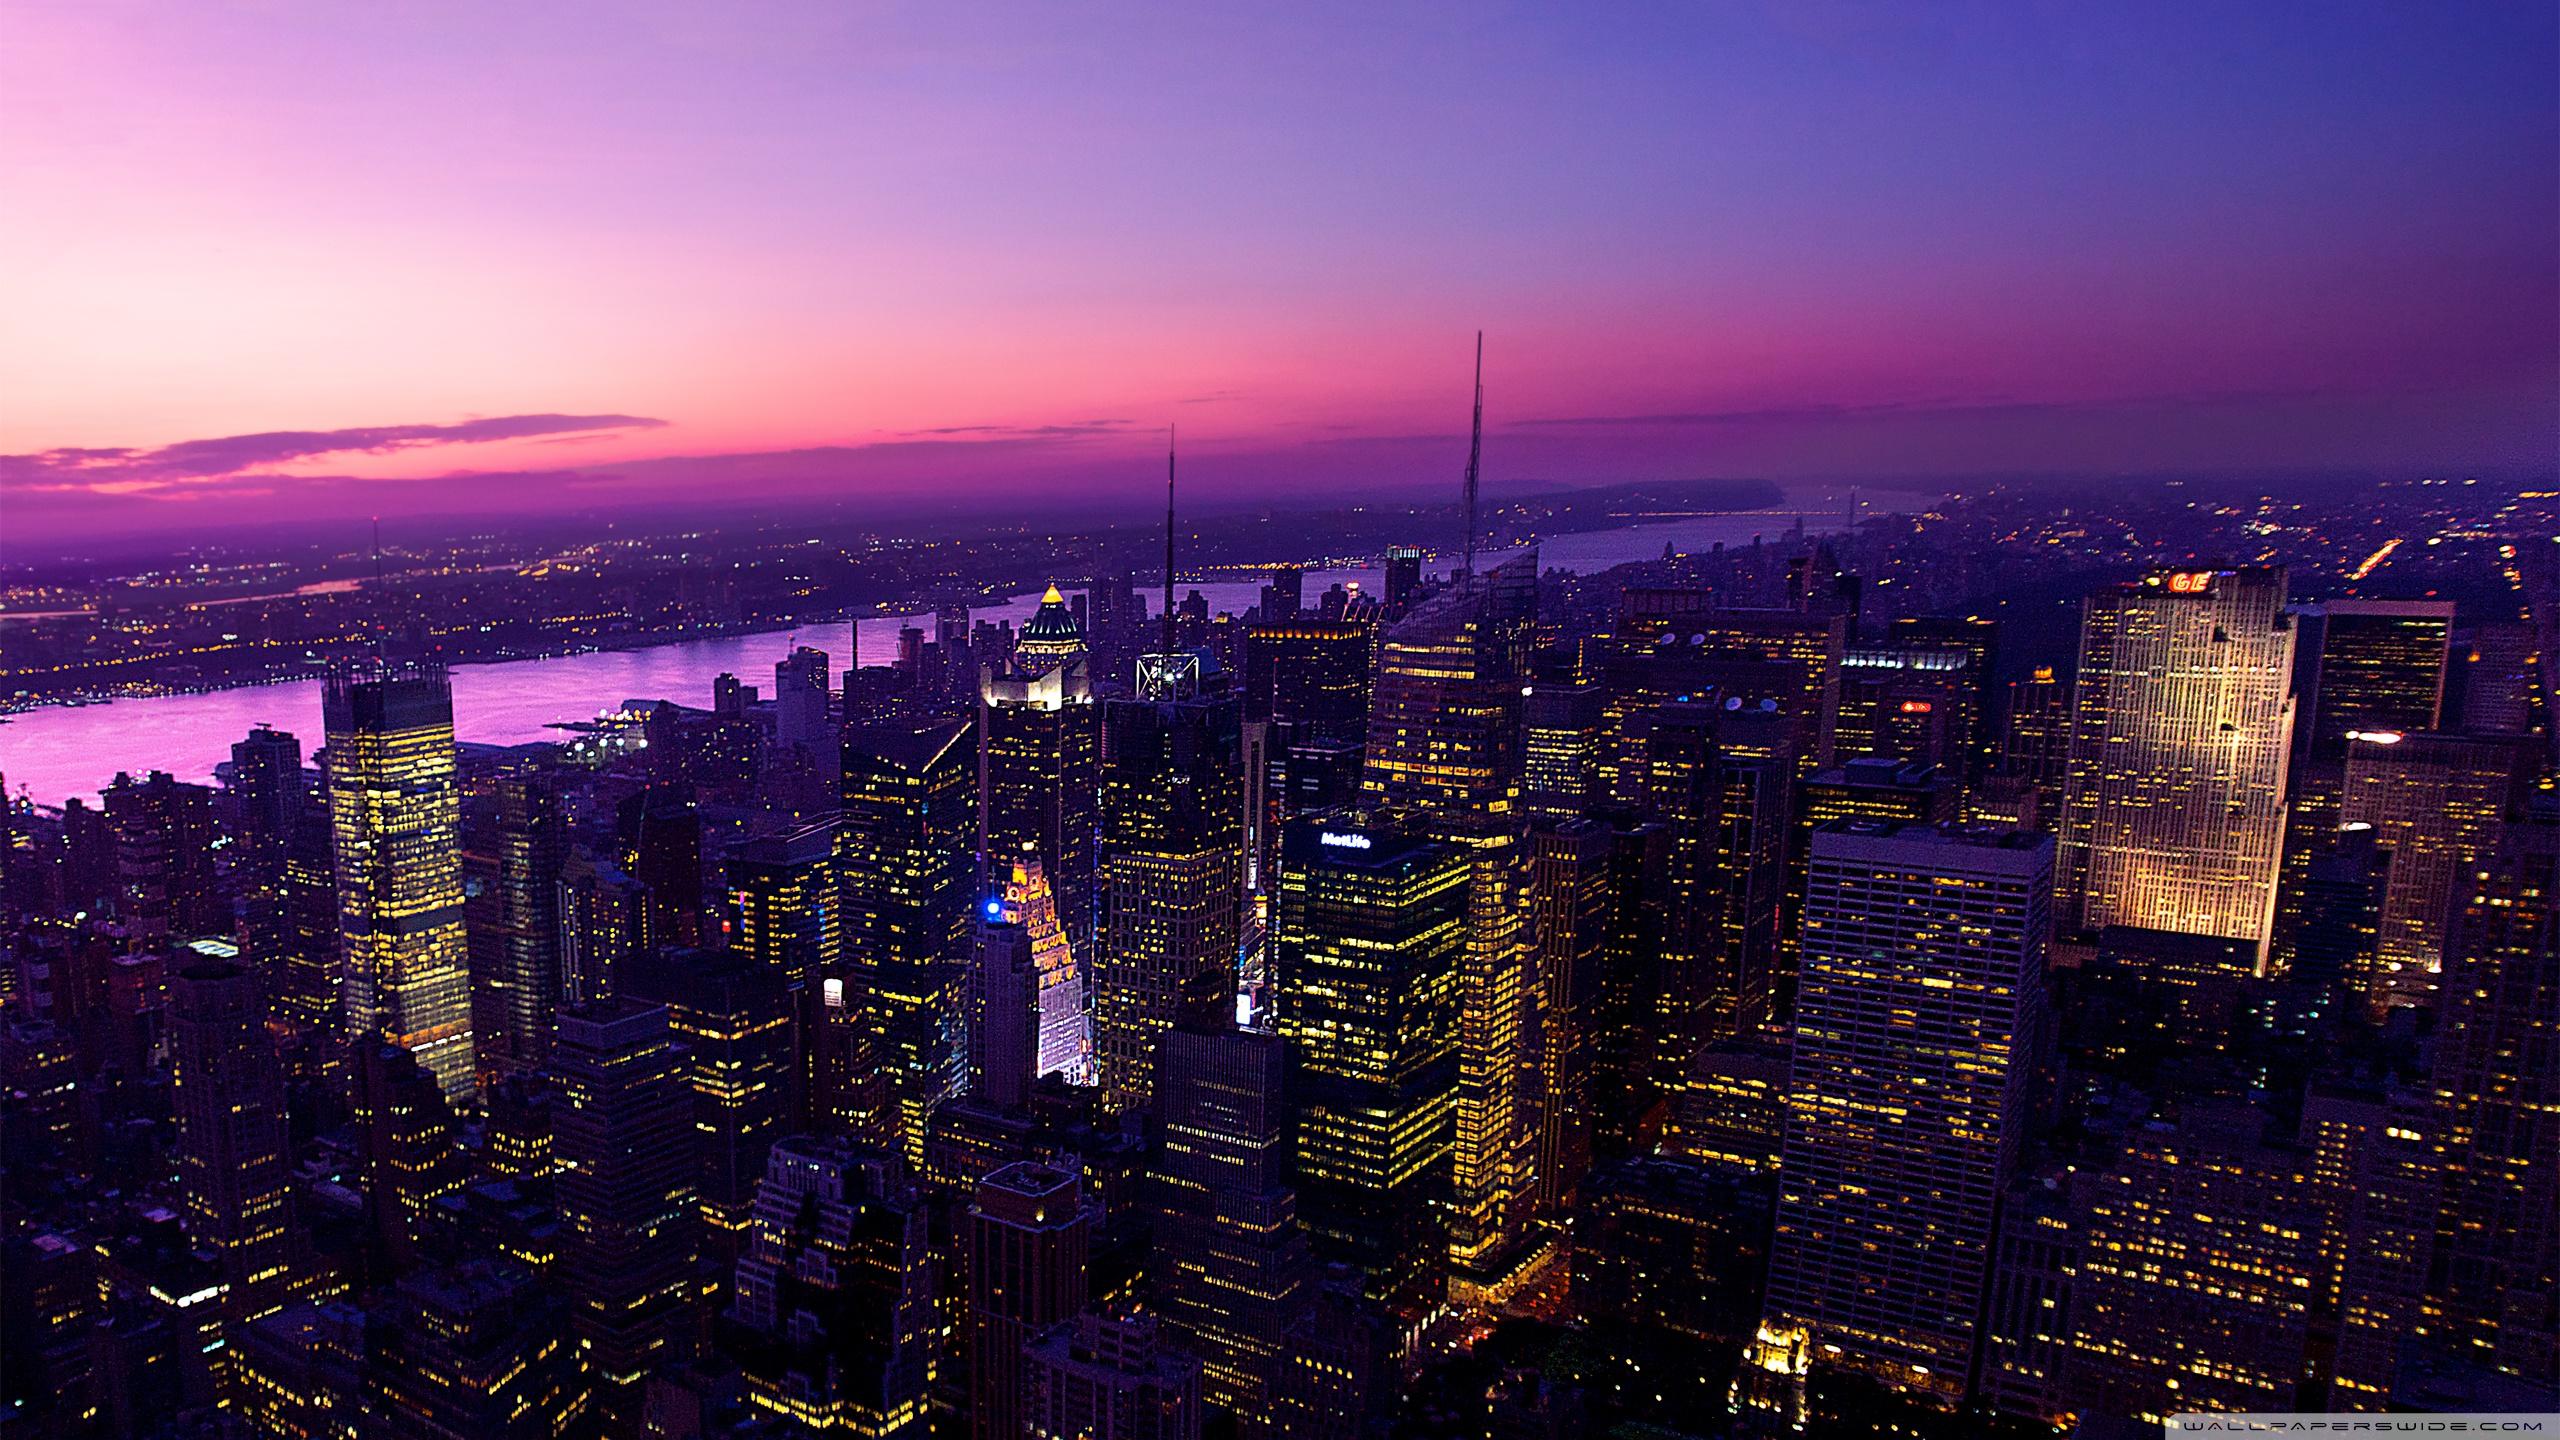 City Sunset ❤ 4K HD Desktop Wallpaper for 4K Ultra HD TV • Wide ...